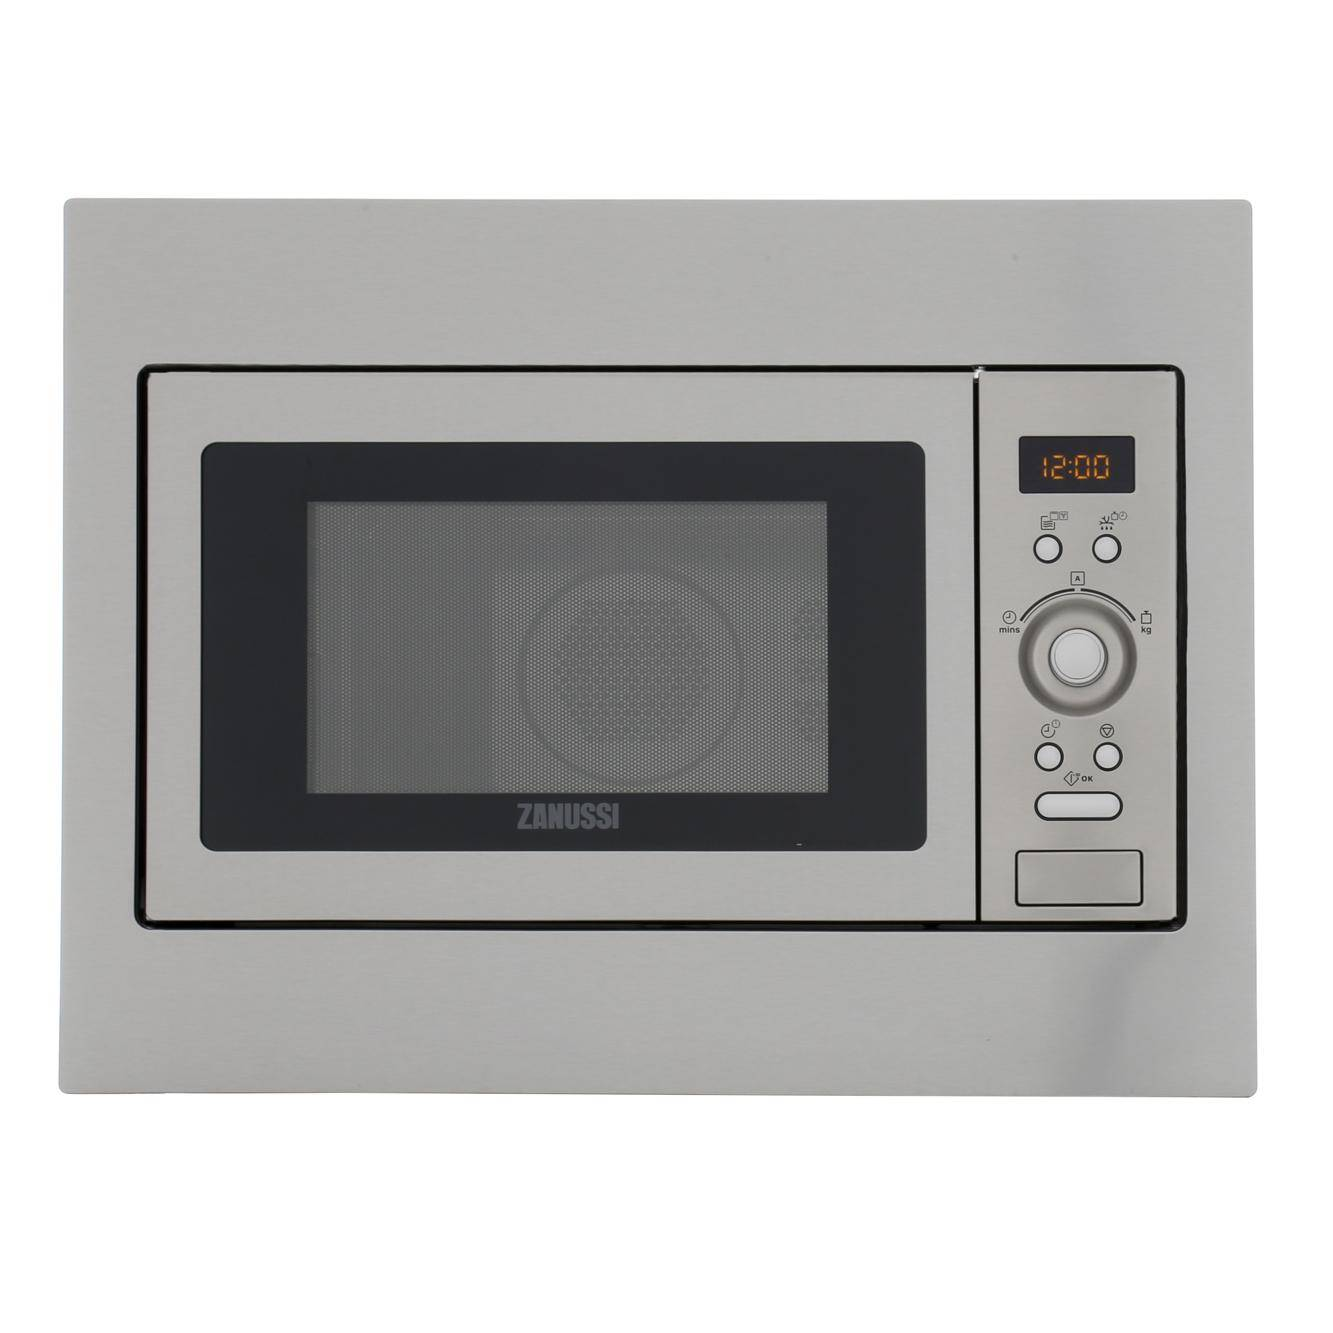 zanussi zkk47902xk built combination microwave stainless ste